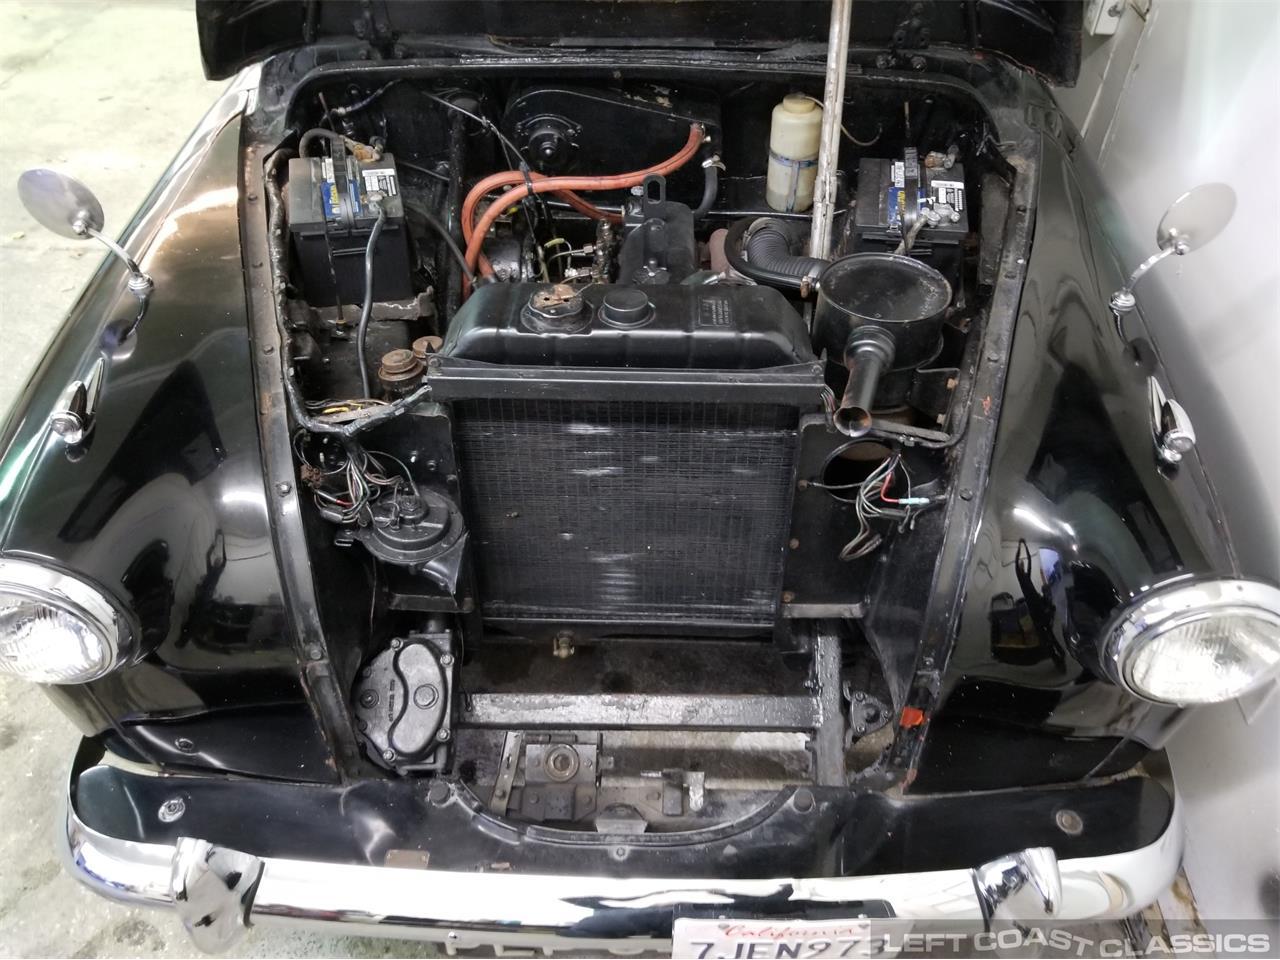 Large Picture of '67 Austin FX4 Taxi Cab - PKBX